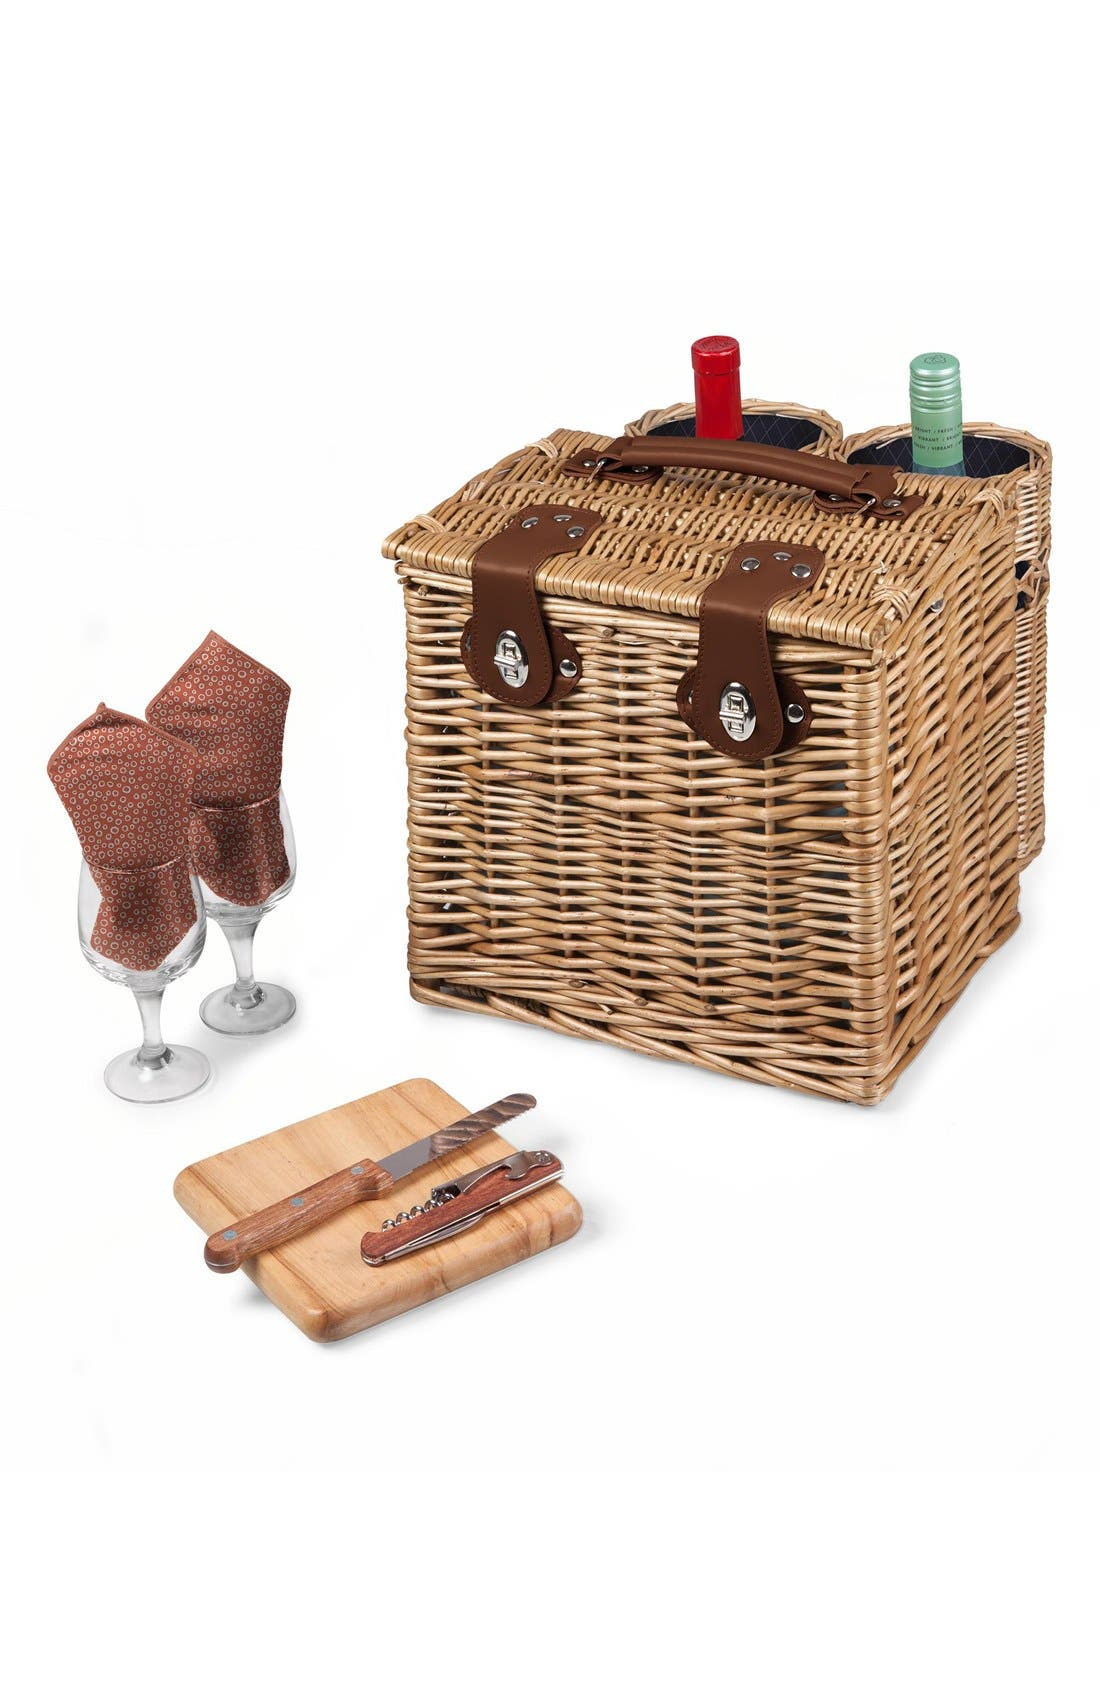 'Vino' Wine & Cheese Picnic Basket,                             Alternate thumbnail 3, color,                             400